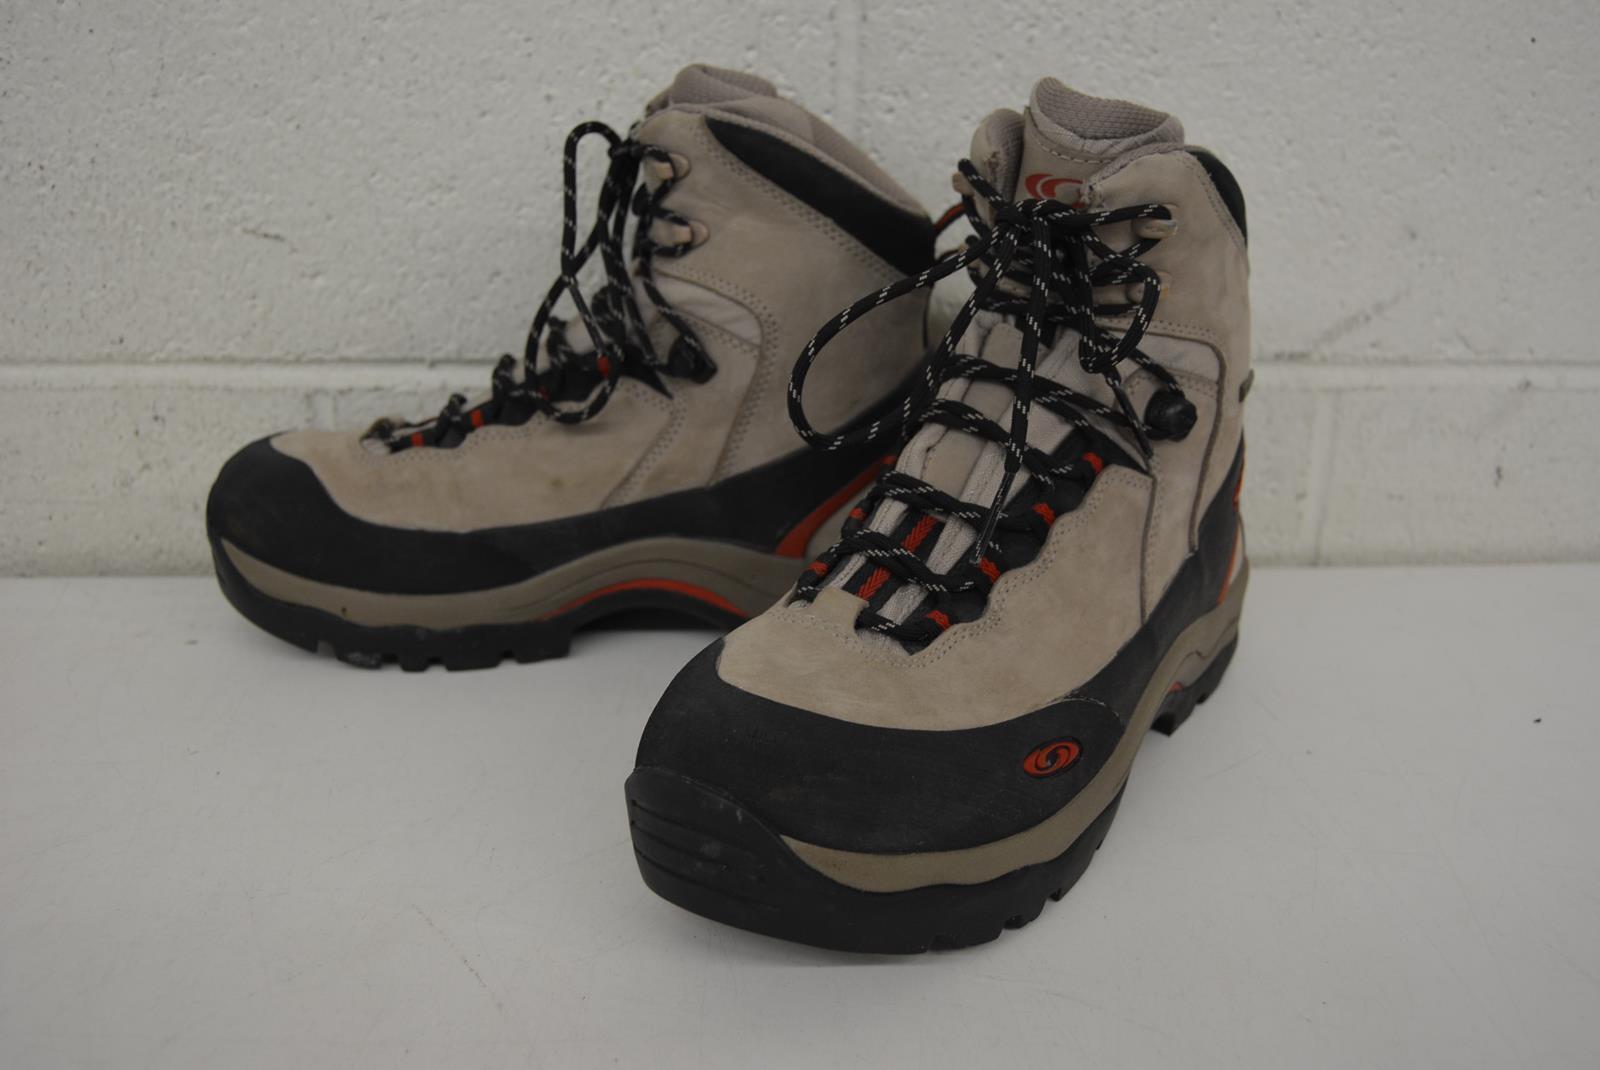 Salomon High-Quality Gore-Tex Padded Winter Hiking Hiking Hiking Boots US Women's 7.5 39 1 3 8d2add